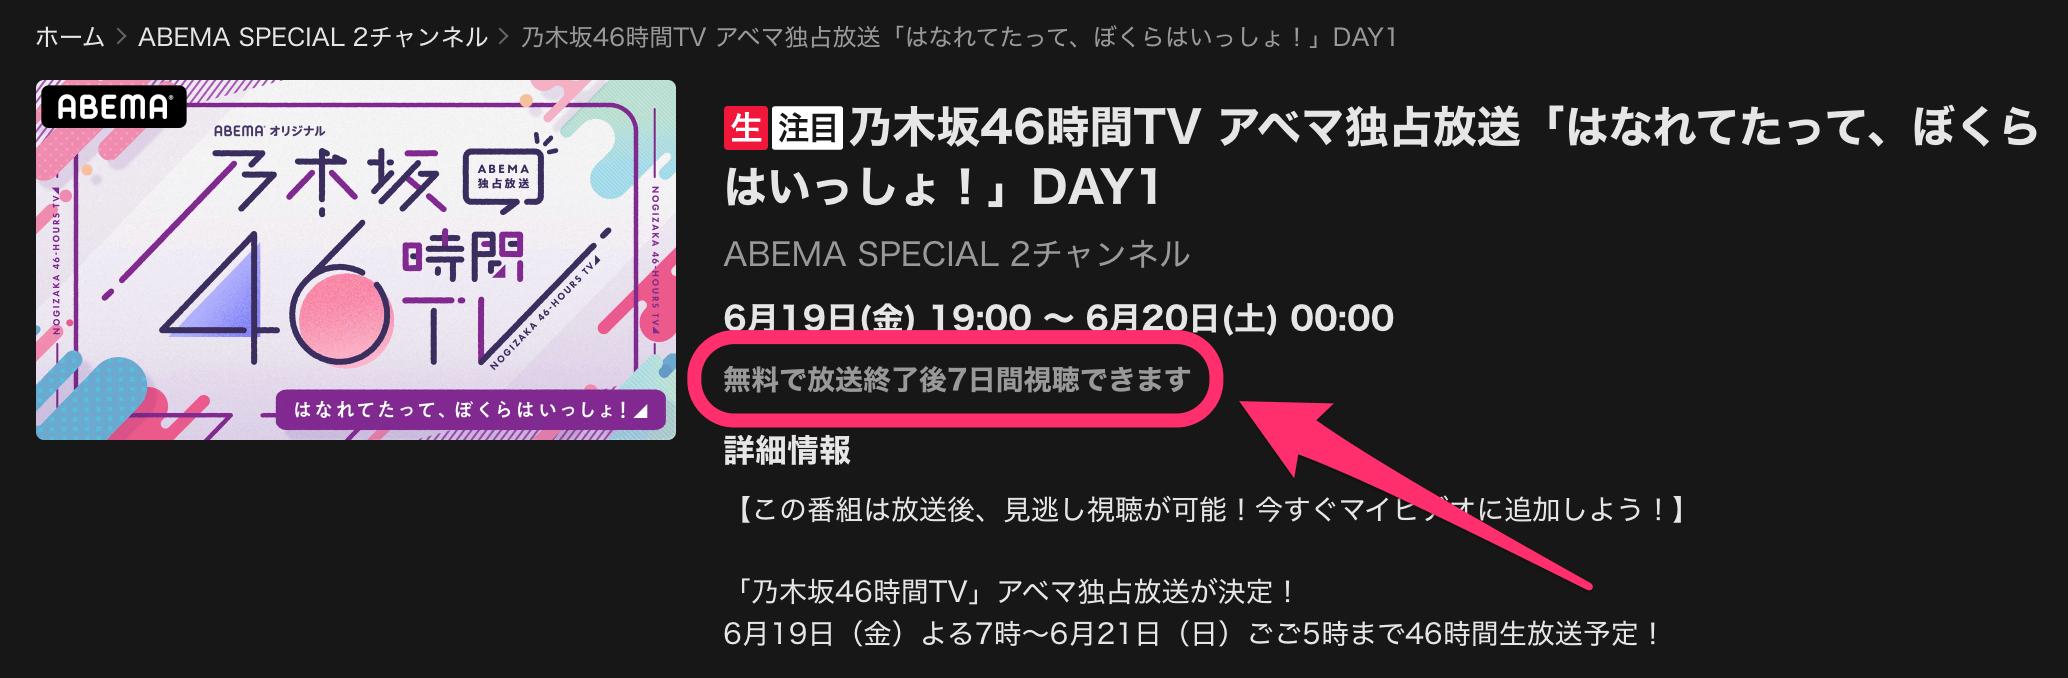 乃木坂46時間TV見逃し配信